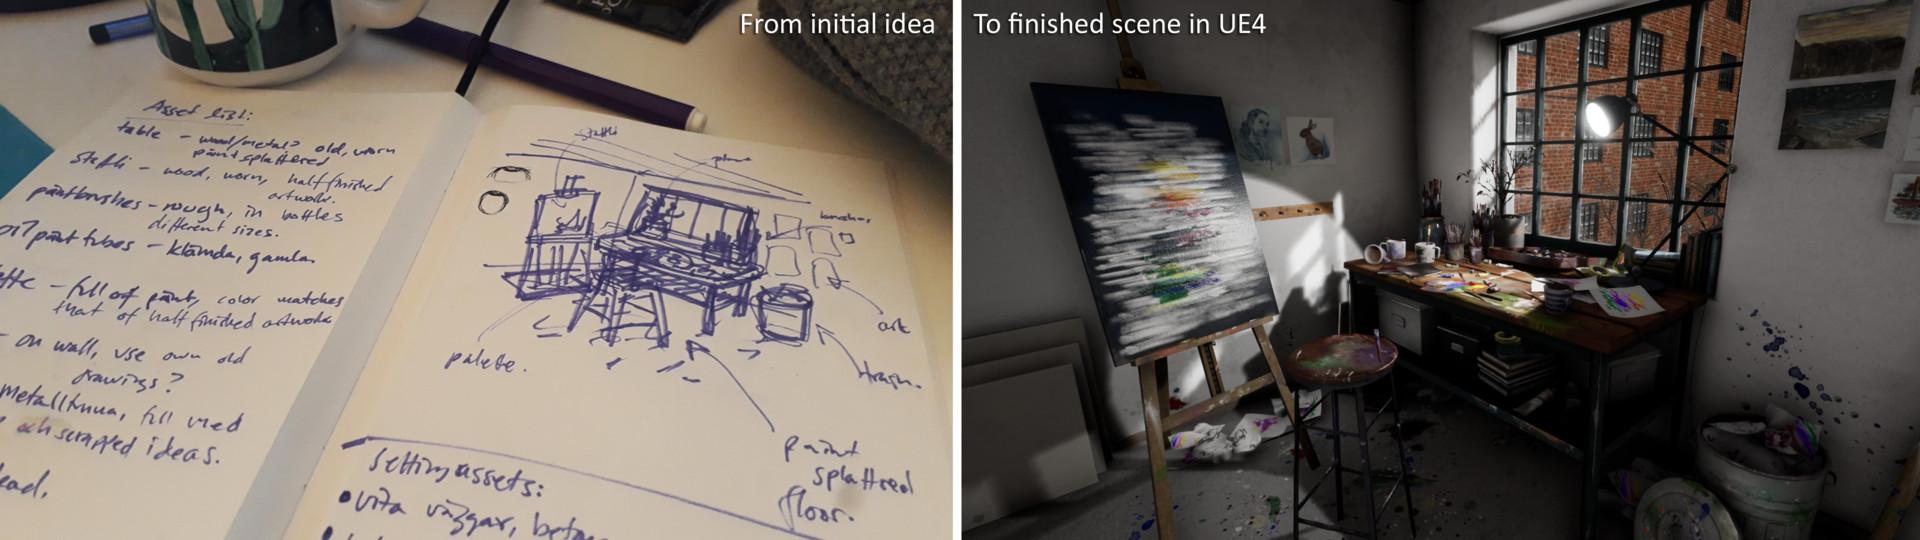 Sara soderman sketch